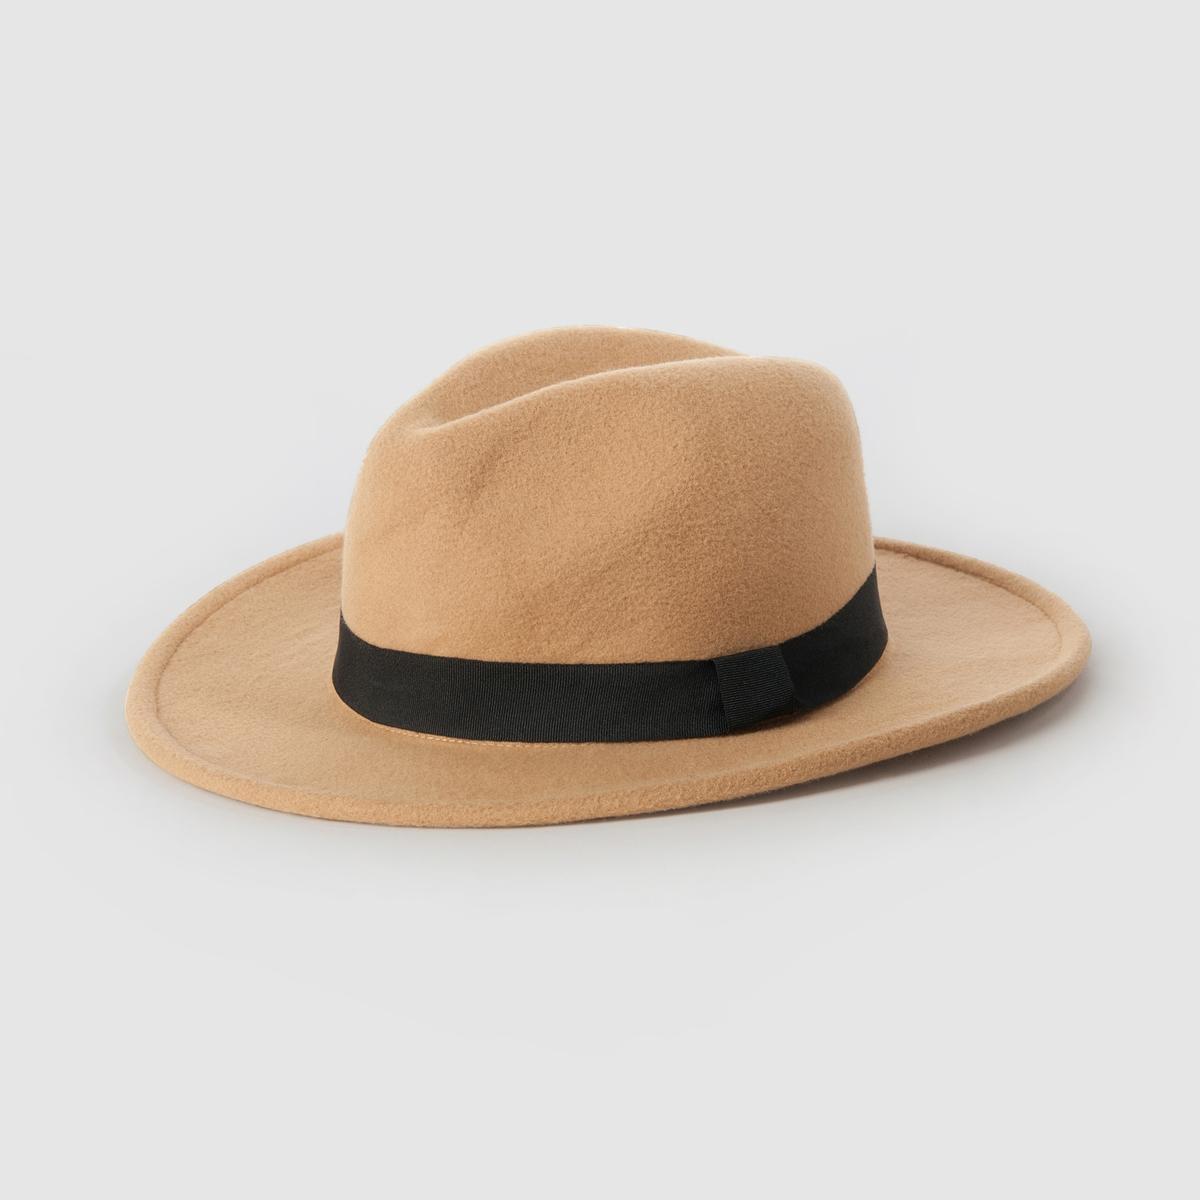 ШляпаШерстяная шляпа - R EssentielsСостав : 100% полиэстер<br><br>Цвет: серый,темно-бежевый<br>Размер: единый размер